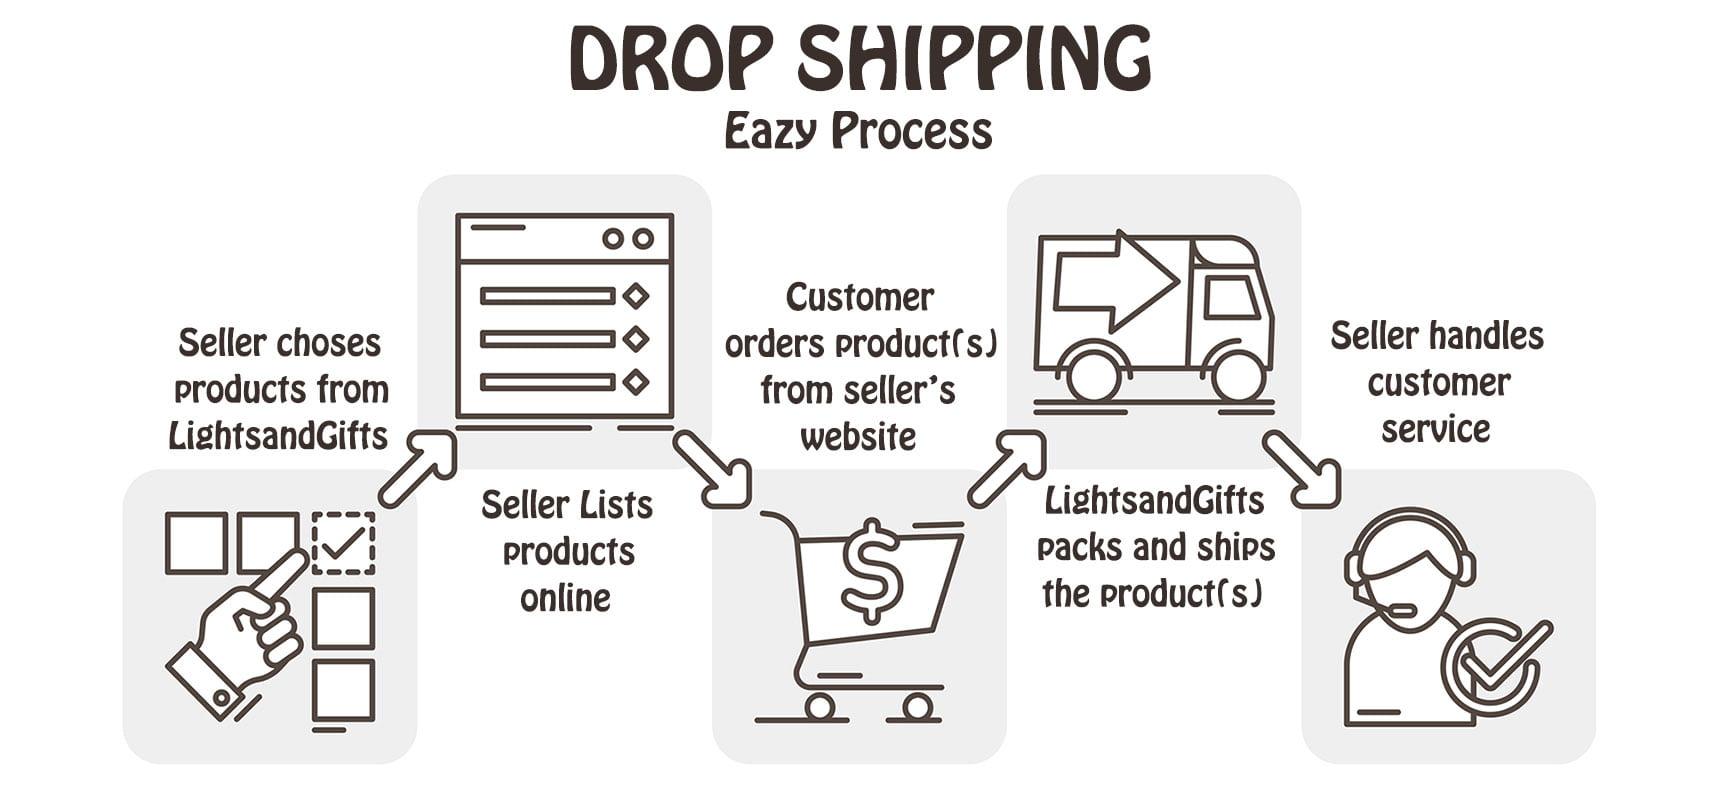 drop shipping process